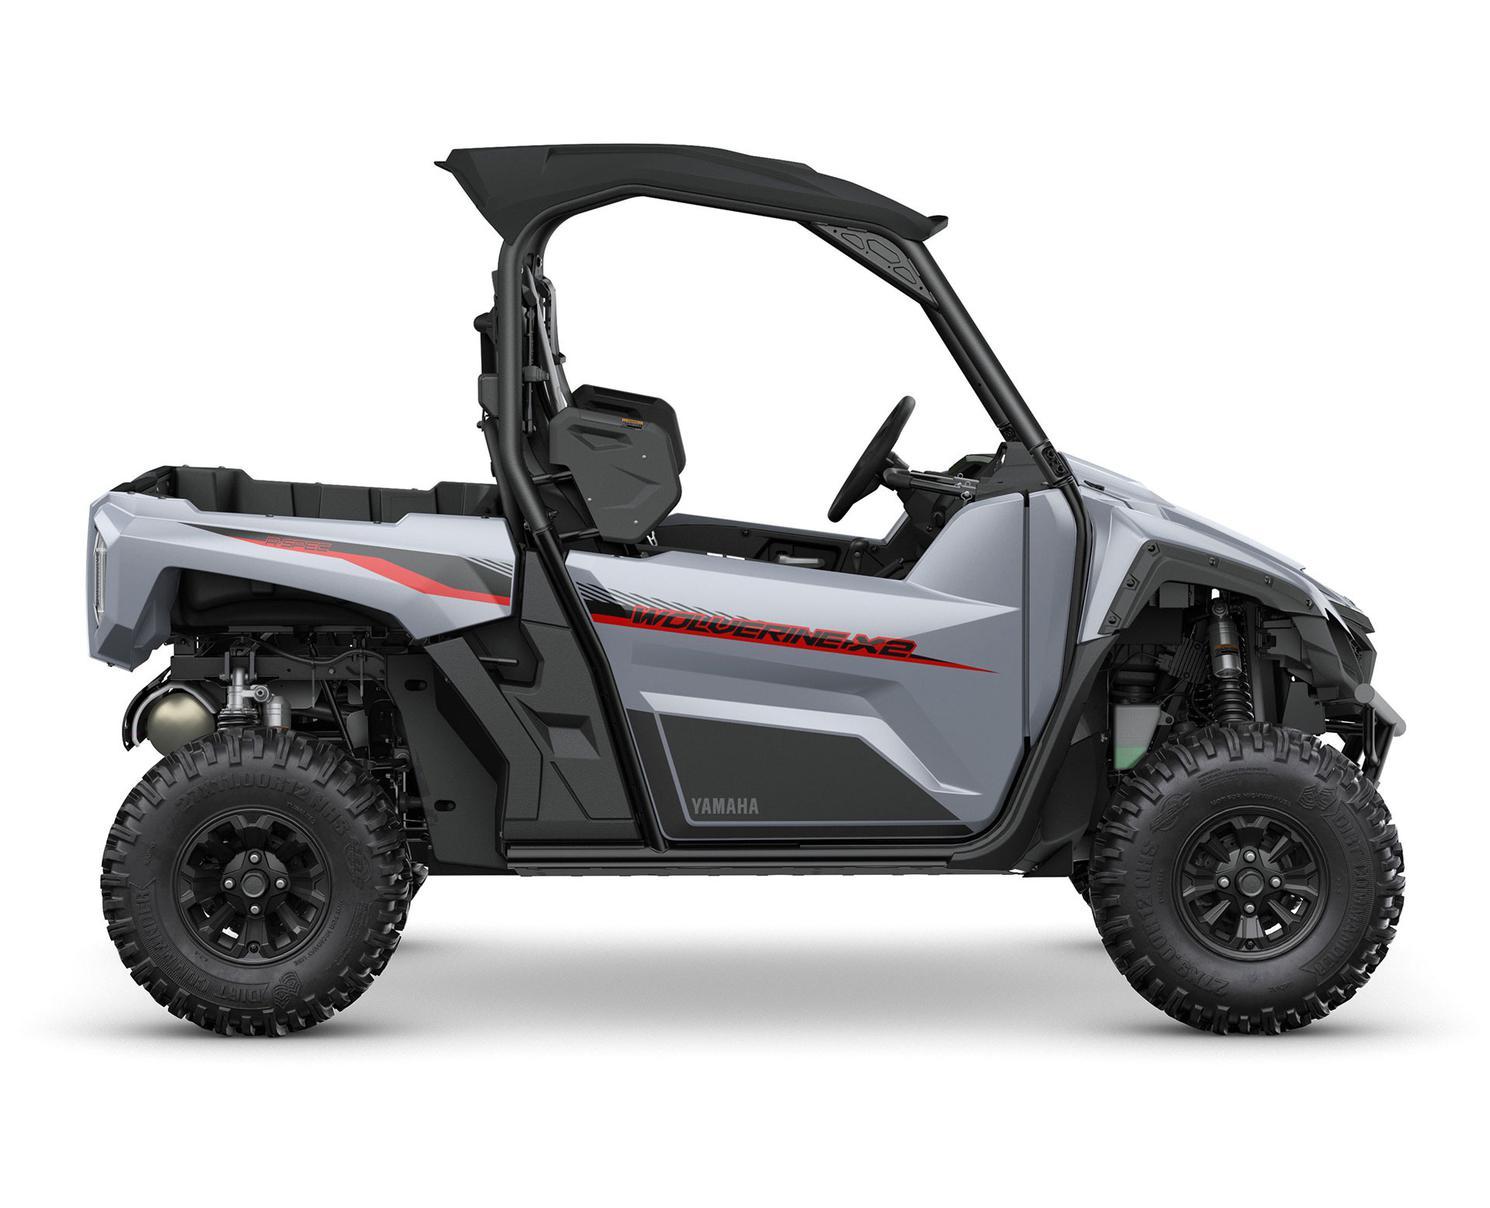 2021 Yamaha Wolverine X2 R-SPEC 850 EPS Armour Grey